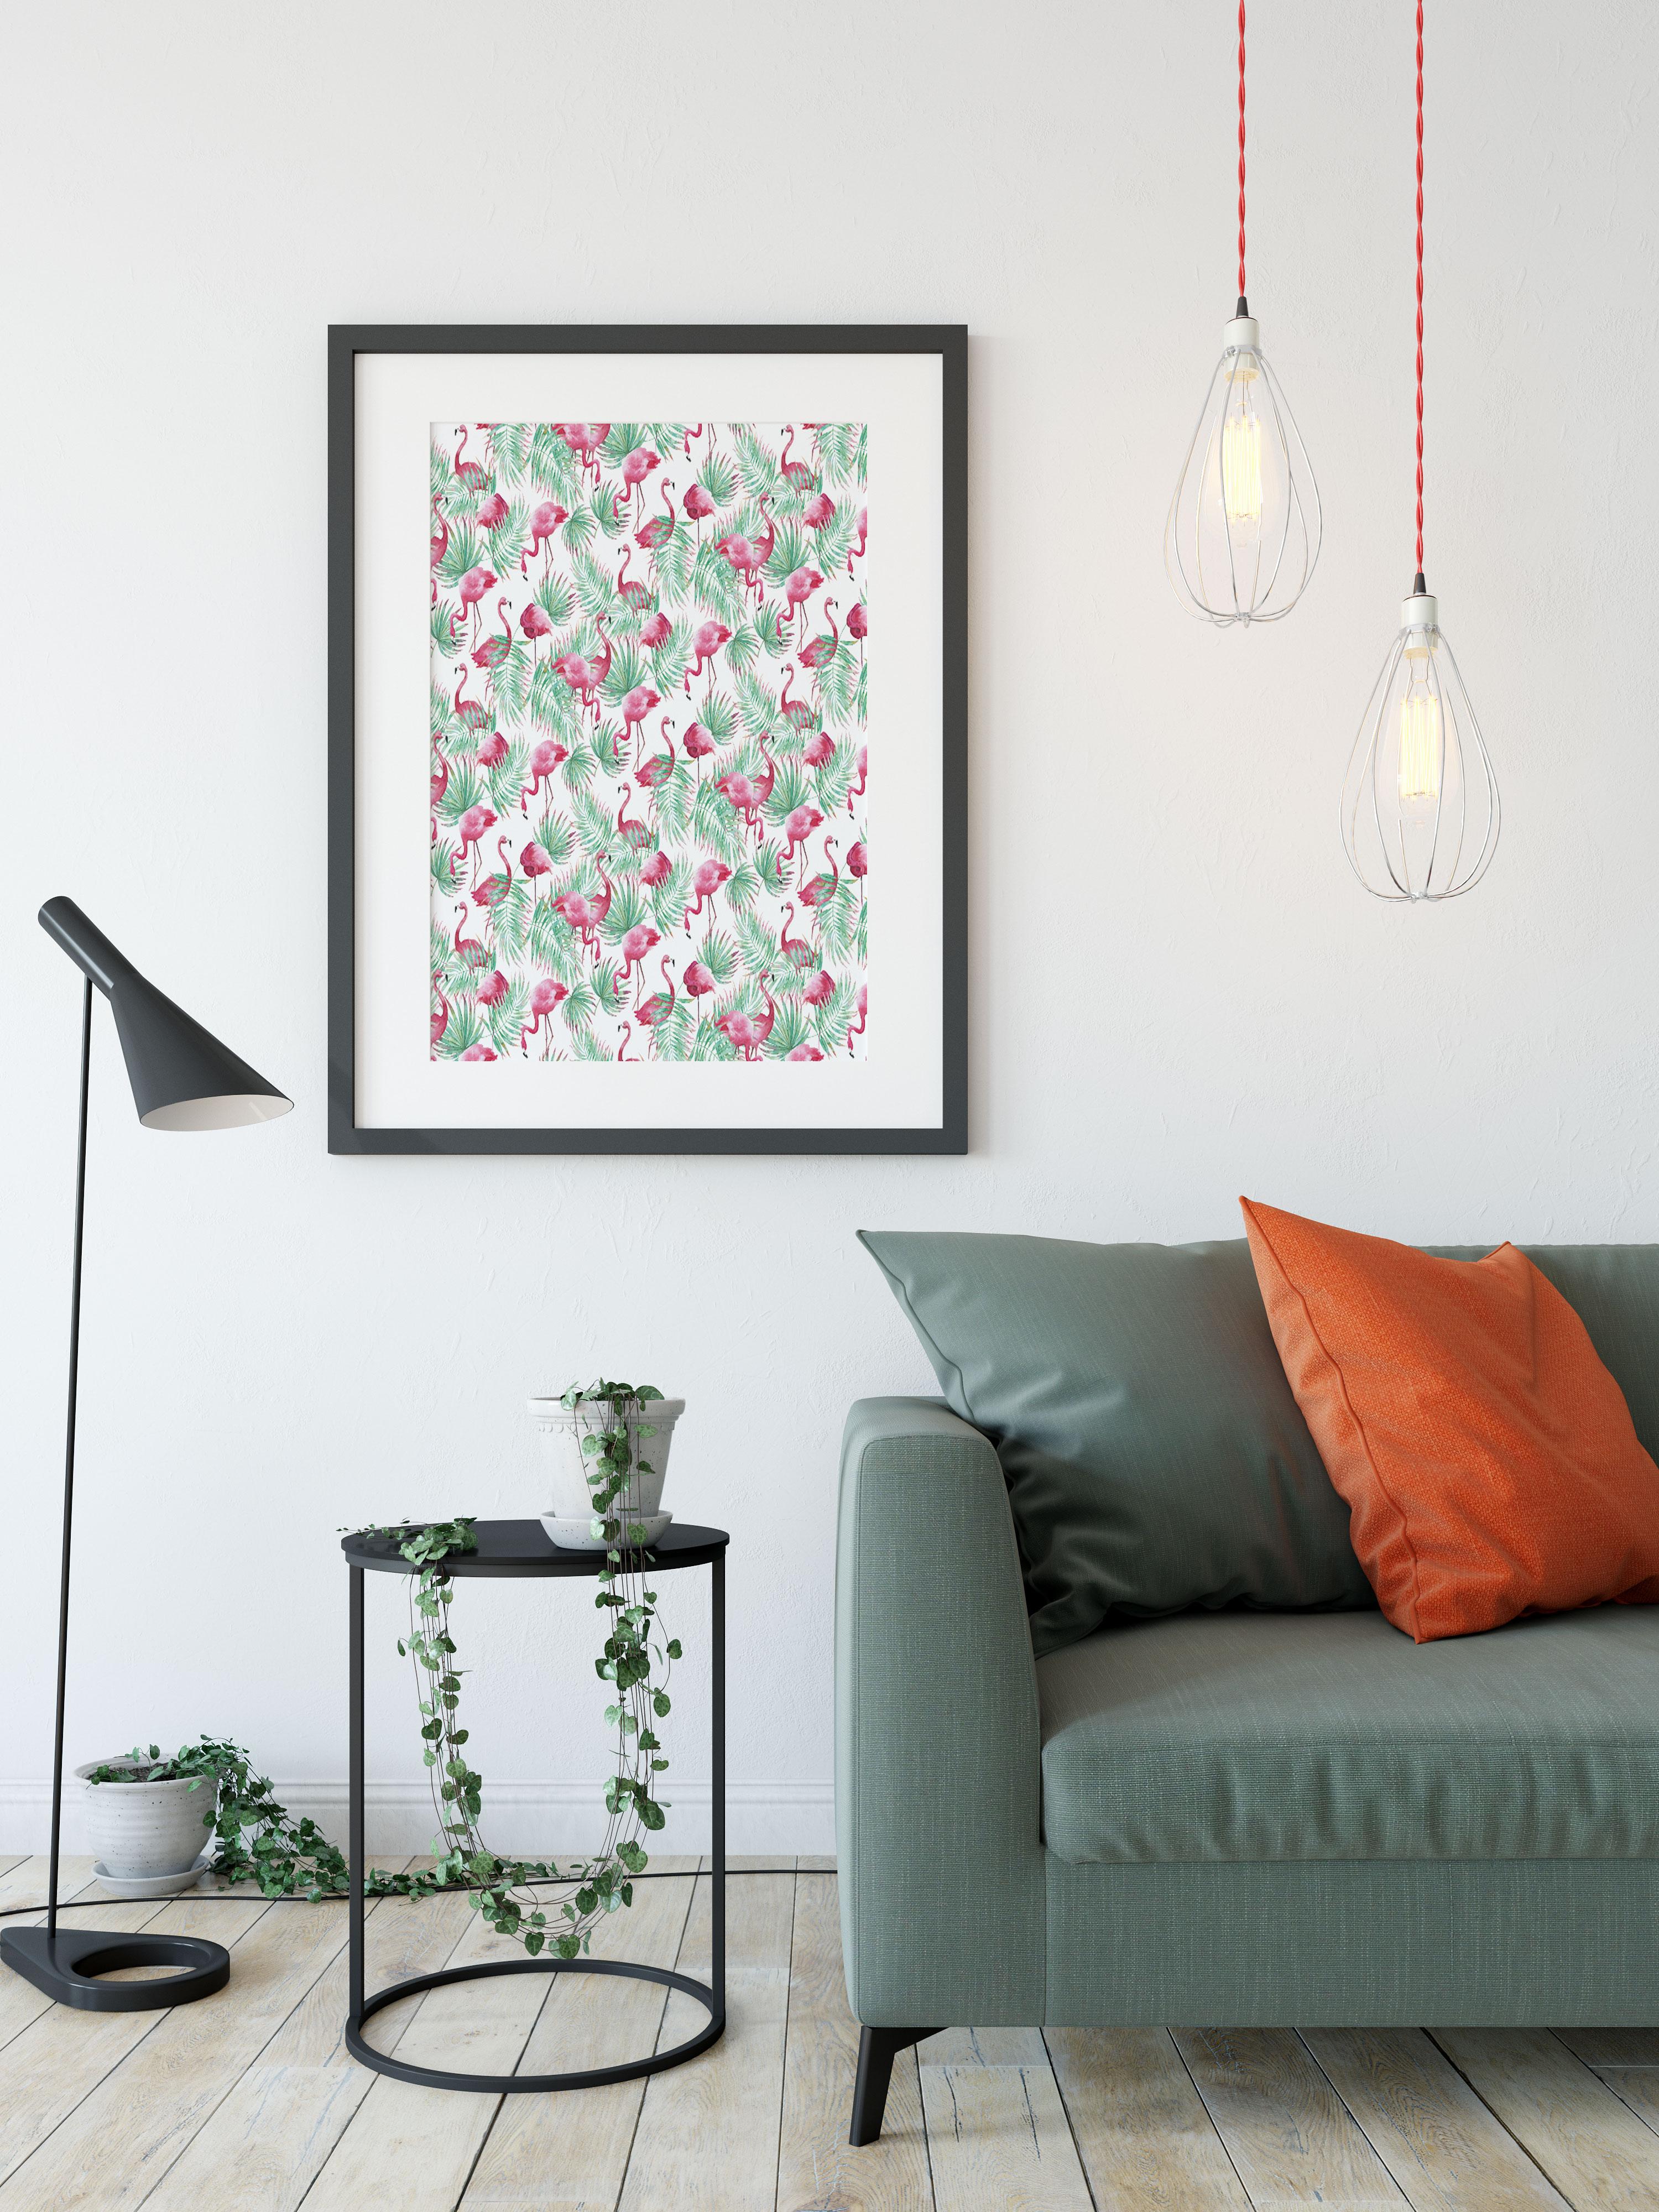 Isabella_FlamingoParadiseSmall_poster09